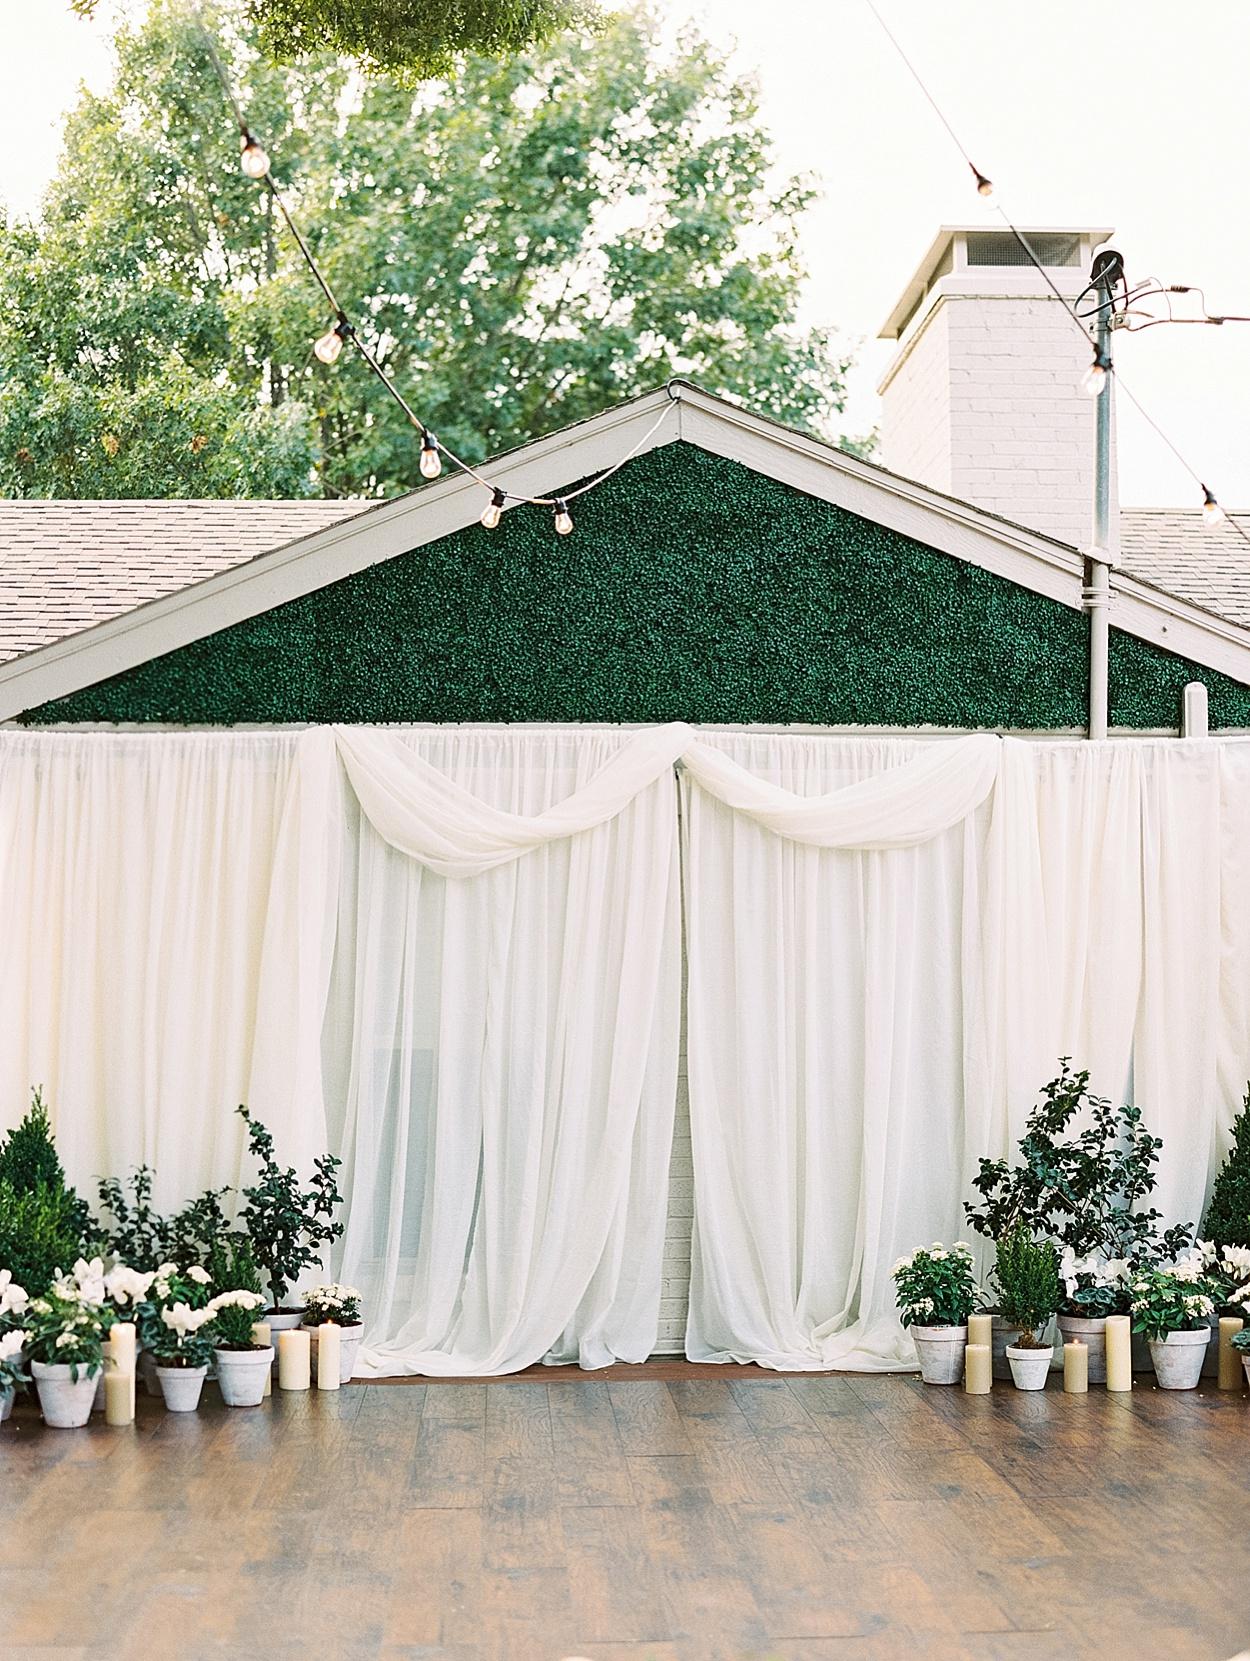 Lindsey Zamora Weddings and Events